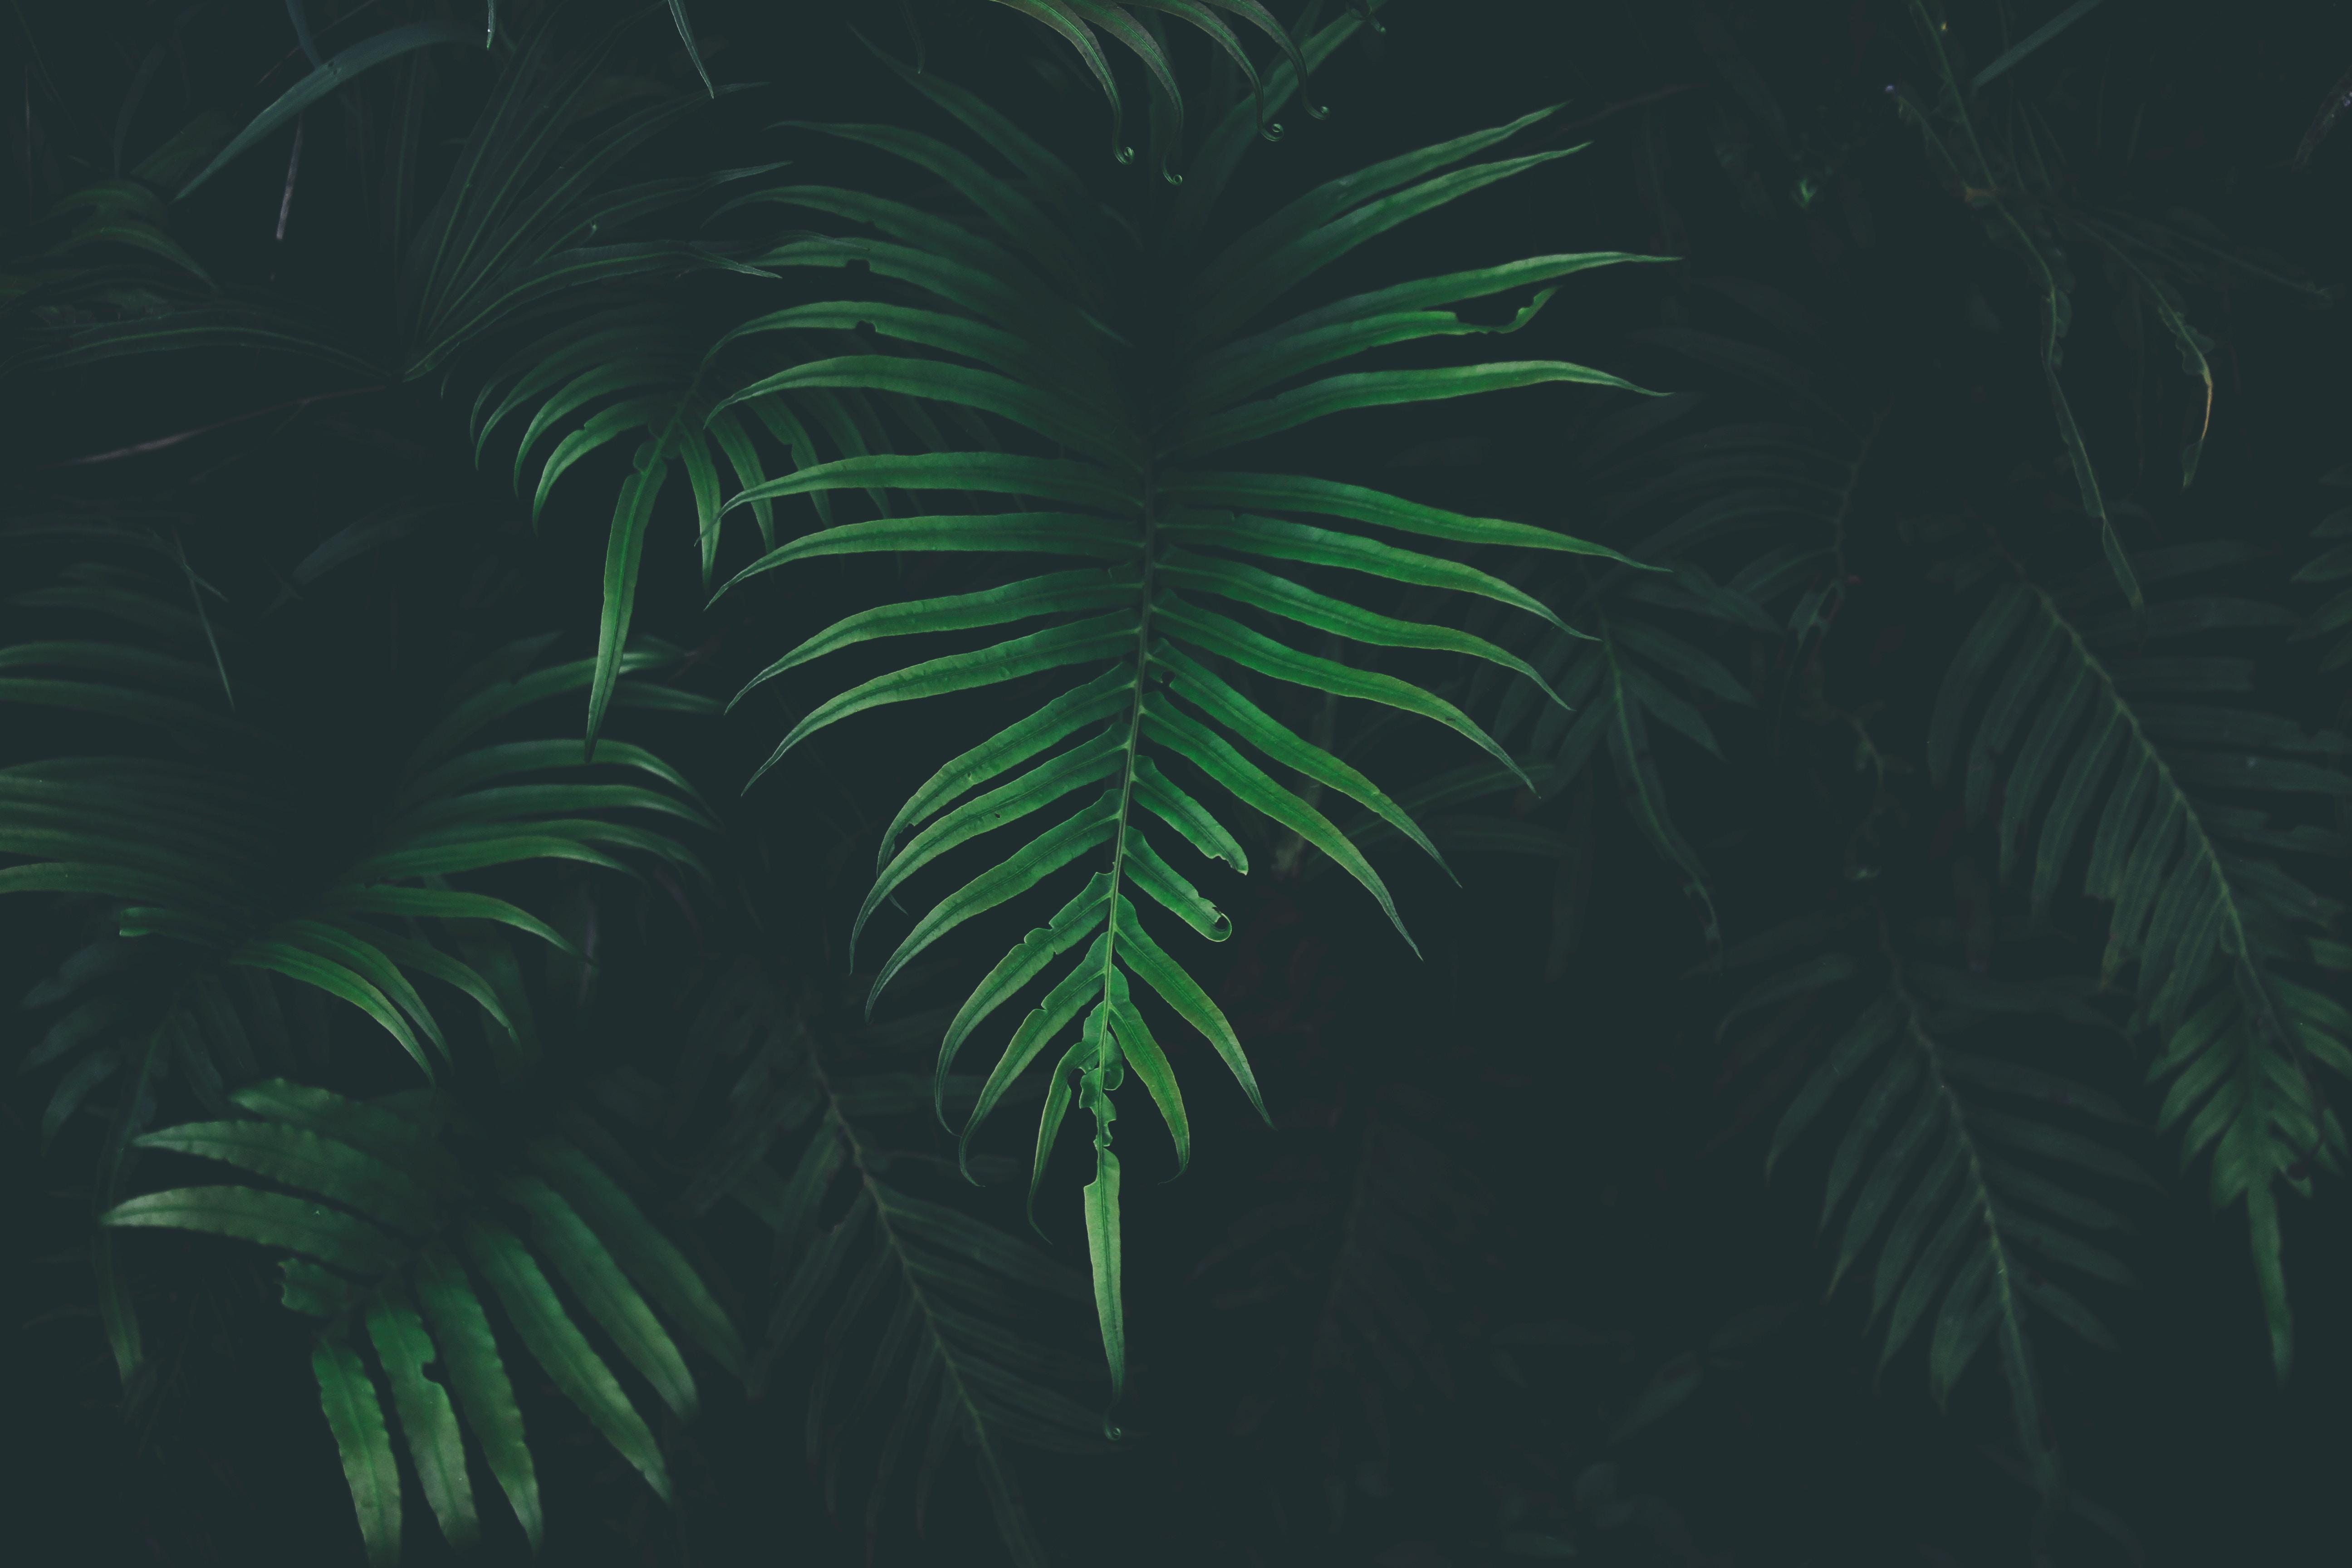 Big Leaves Cool Temperature 5k, HD Nature, 4k Wallpapers